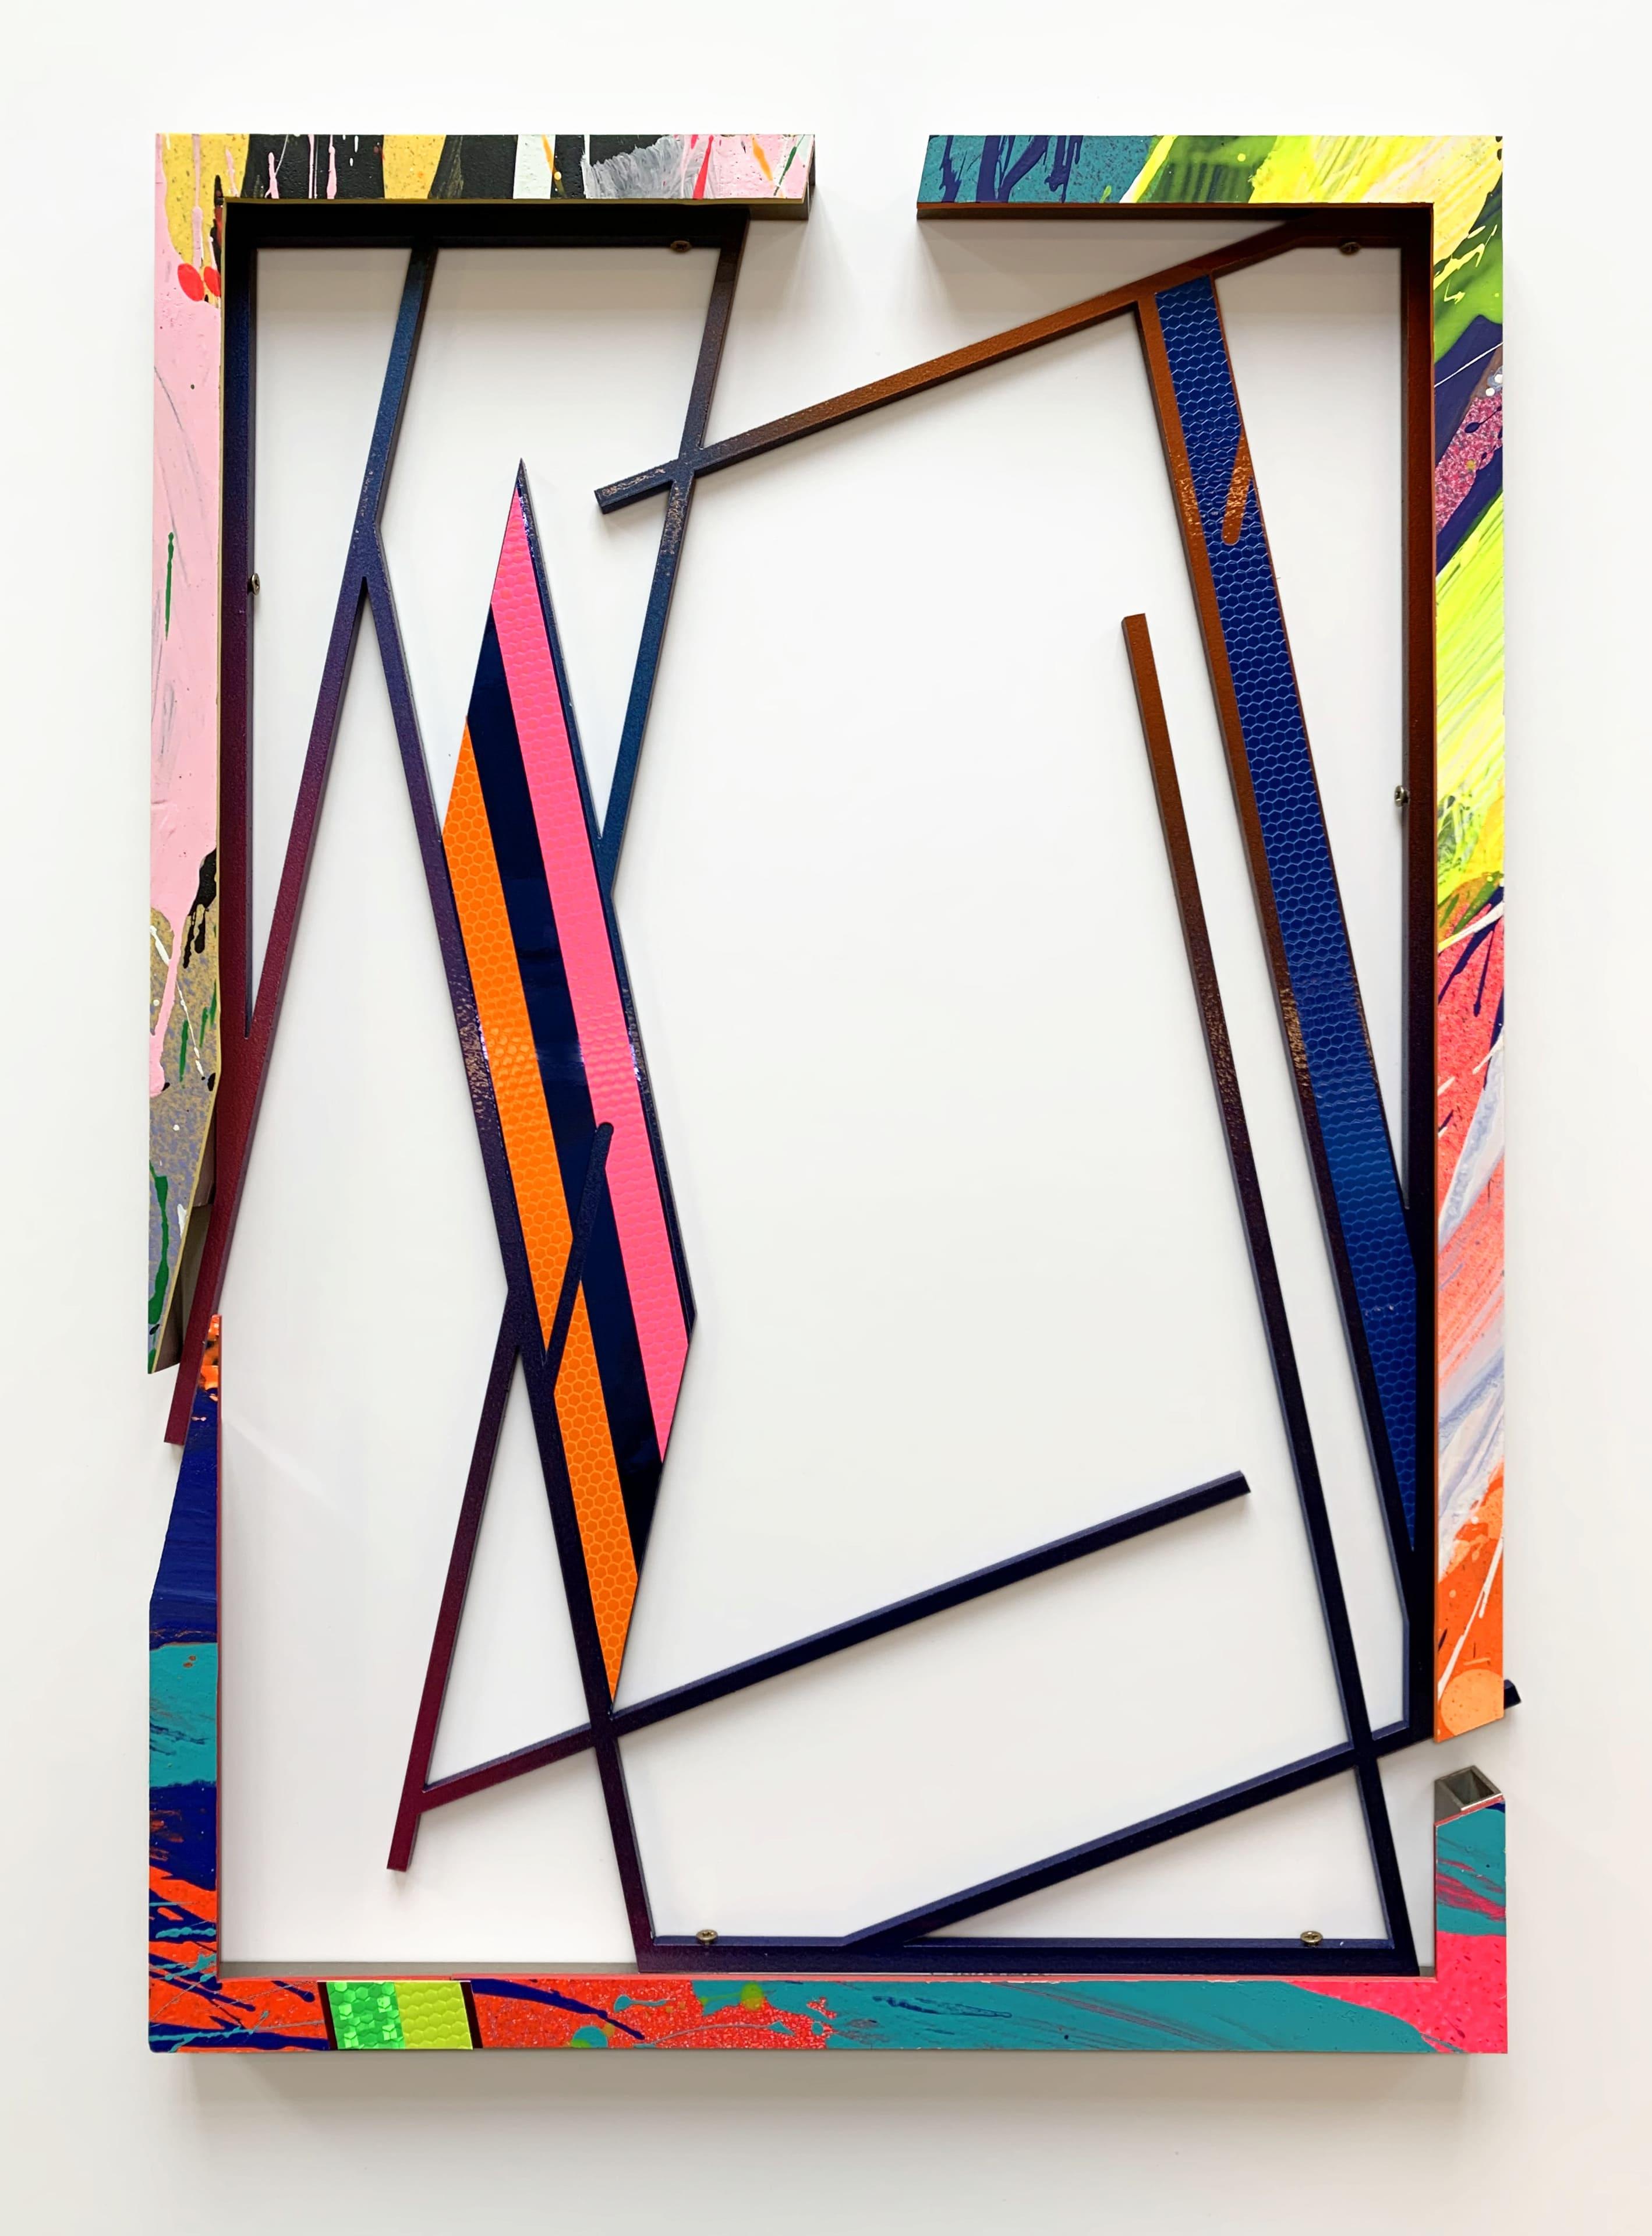 NemesM_F.O.M.O.-04_2020_57x40cm_aluminium-waterjet-aluminium-carpaint-acrilyc-foamex-pvc-light-reflective-vinyl-mirror-board-min